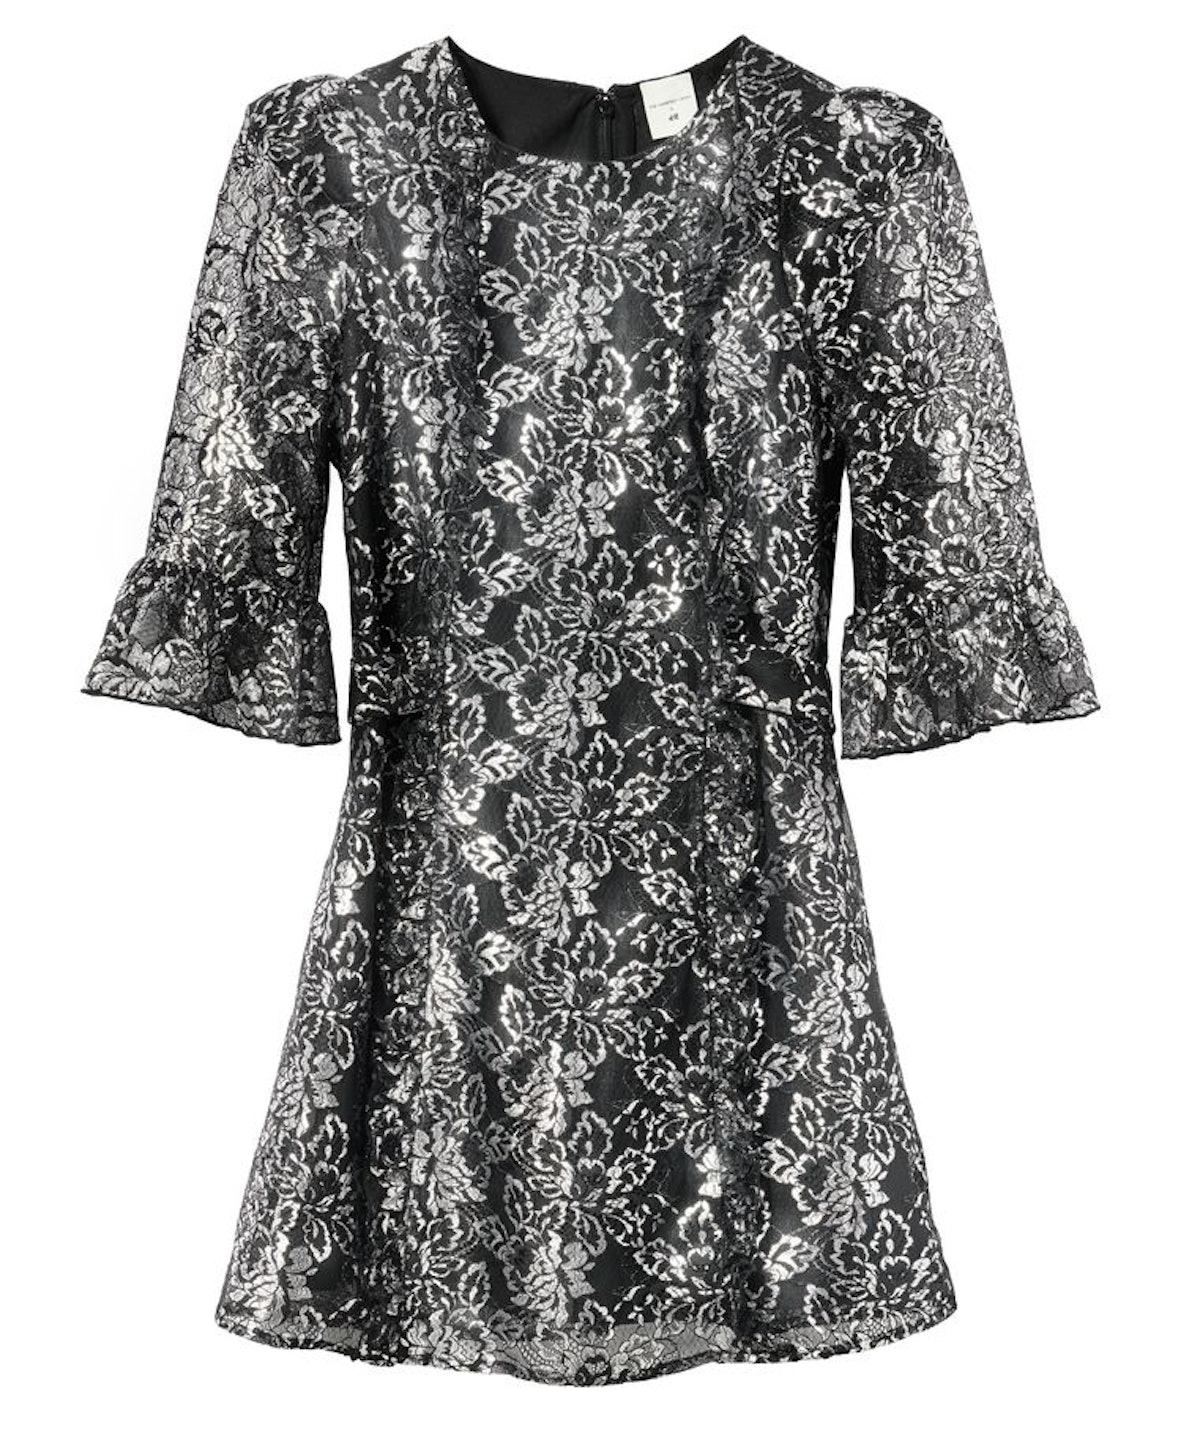 H&M x the Vampire's Wife Silver Lace Mini Dress